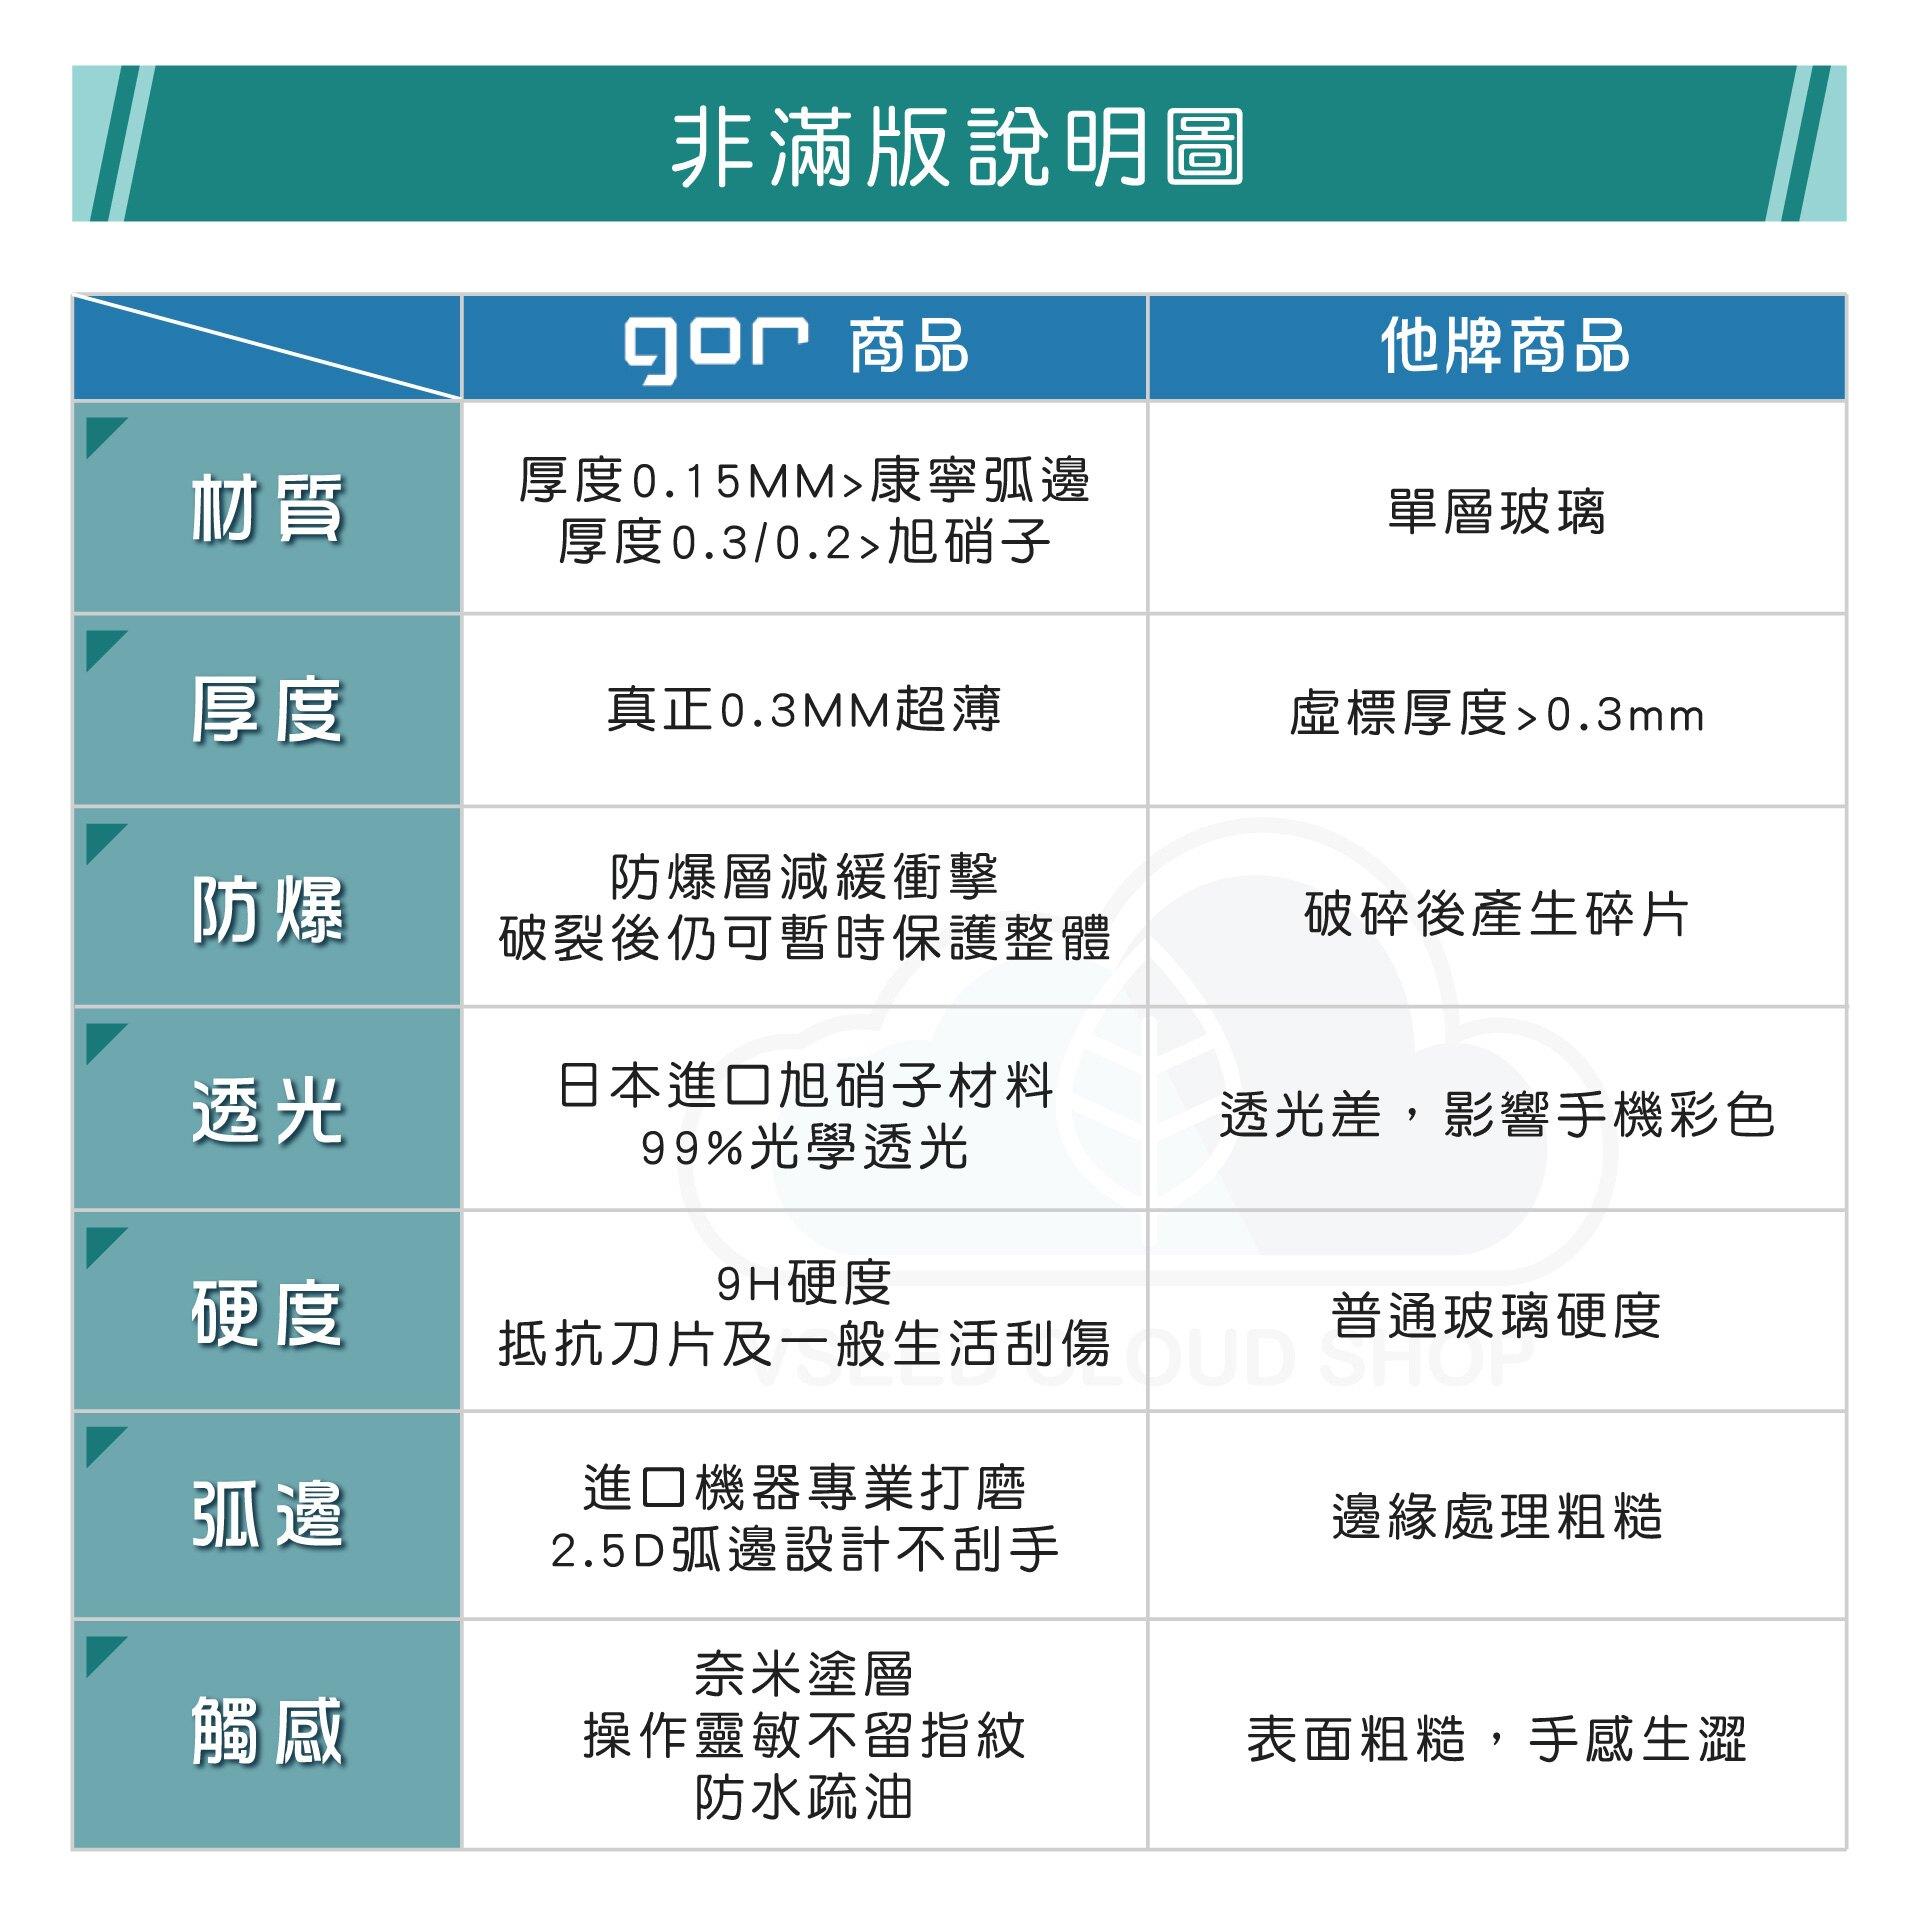 GOR 9H OPPO AX7 Pro 鋼化 玻璃 保護貼 全透明非滿版 兩片裝【另售 清水套 滿299免運費】